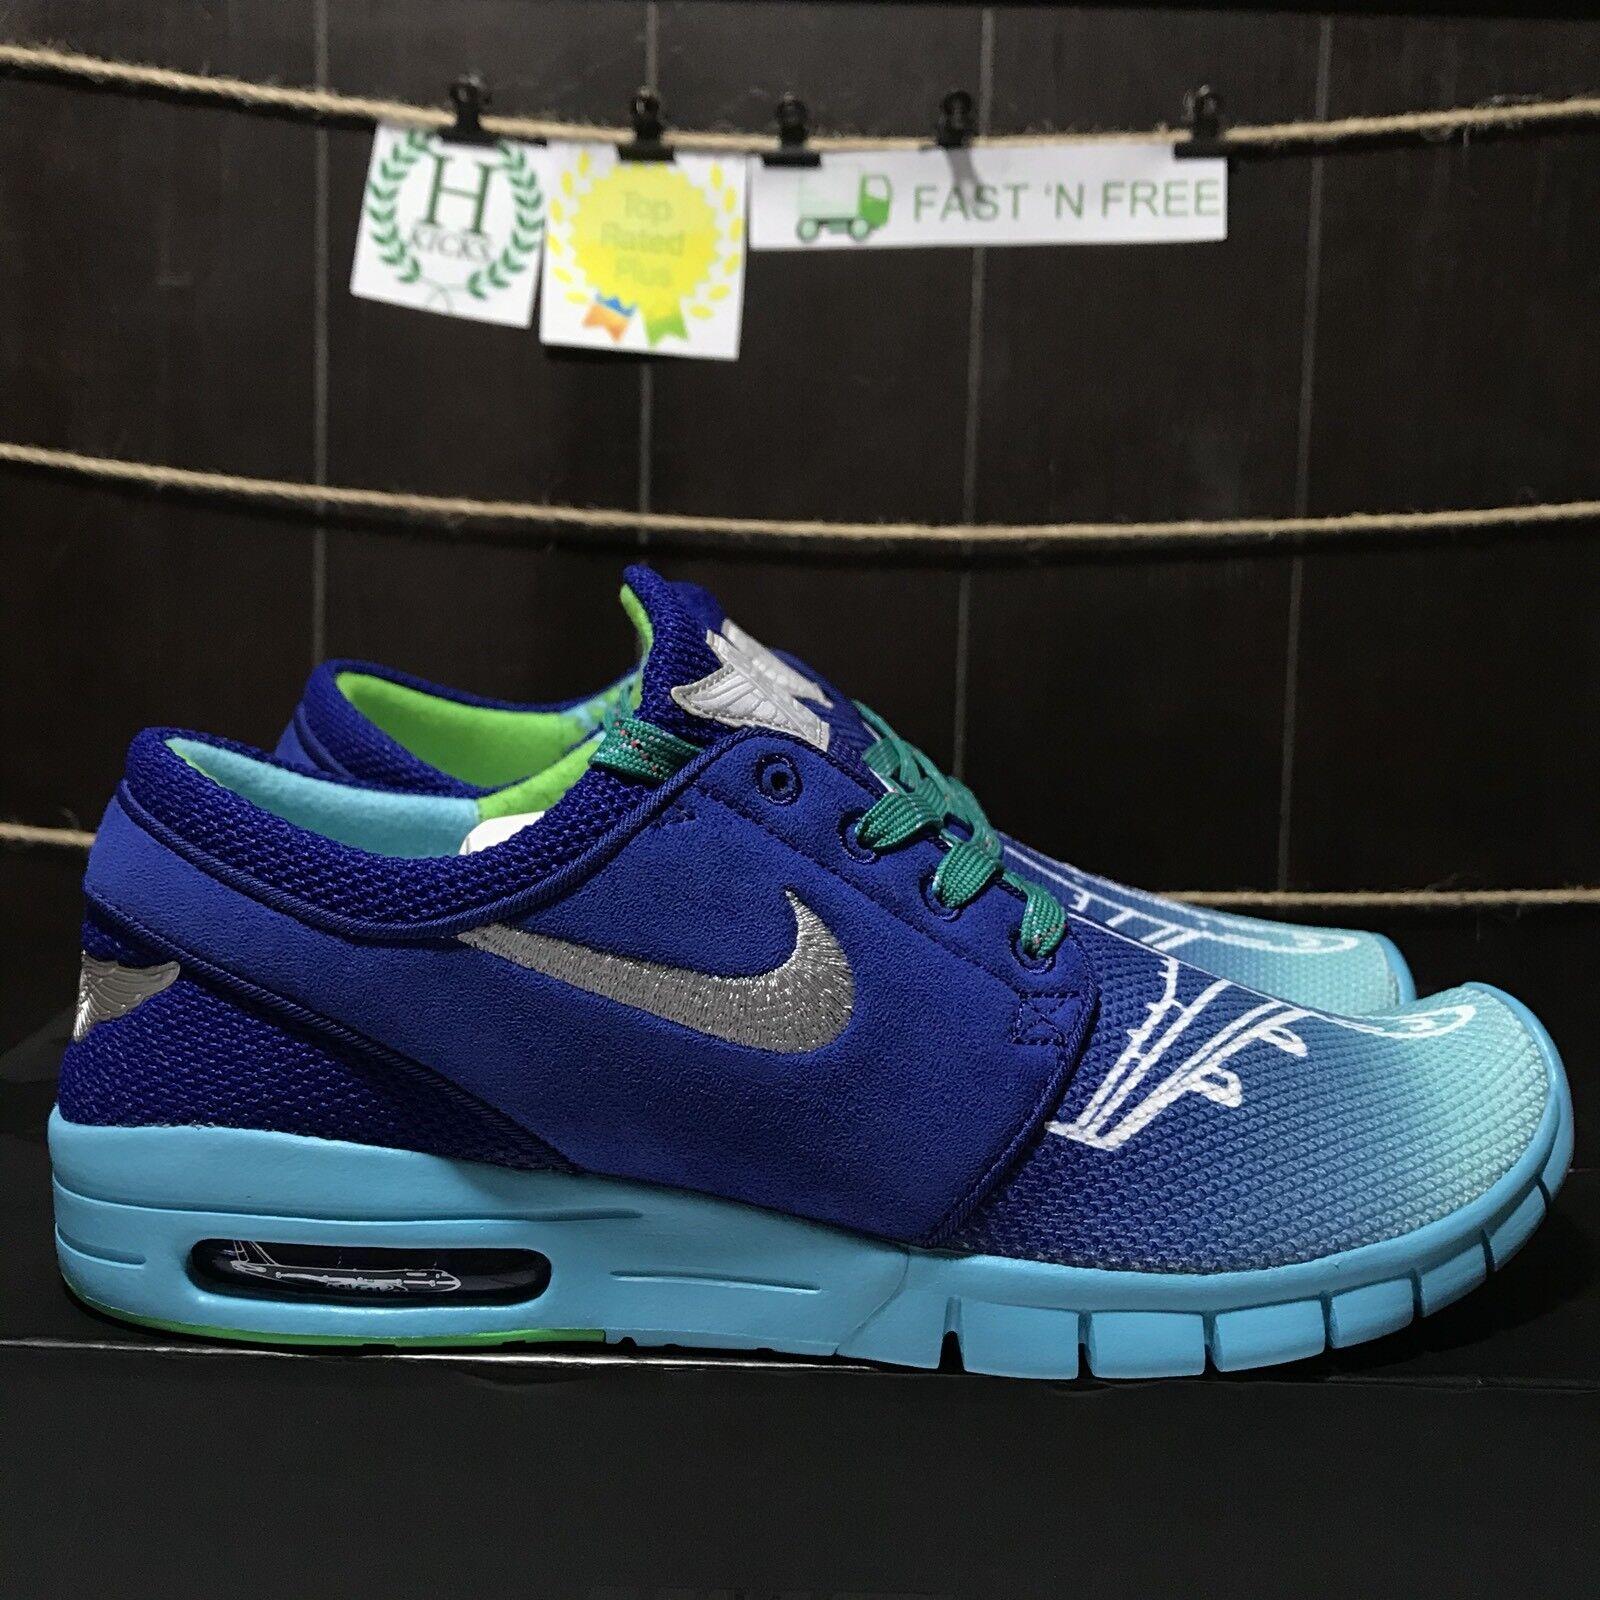 Nike Stefan Janoski Max Doernbecher Airplane Deep Royal Blue 898640 404 Size 12